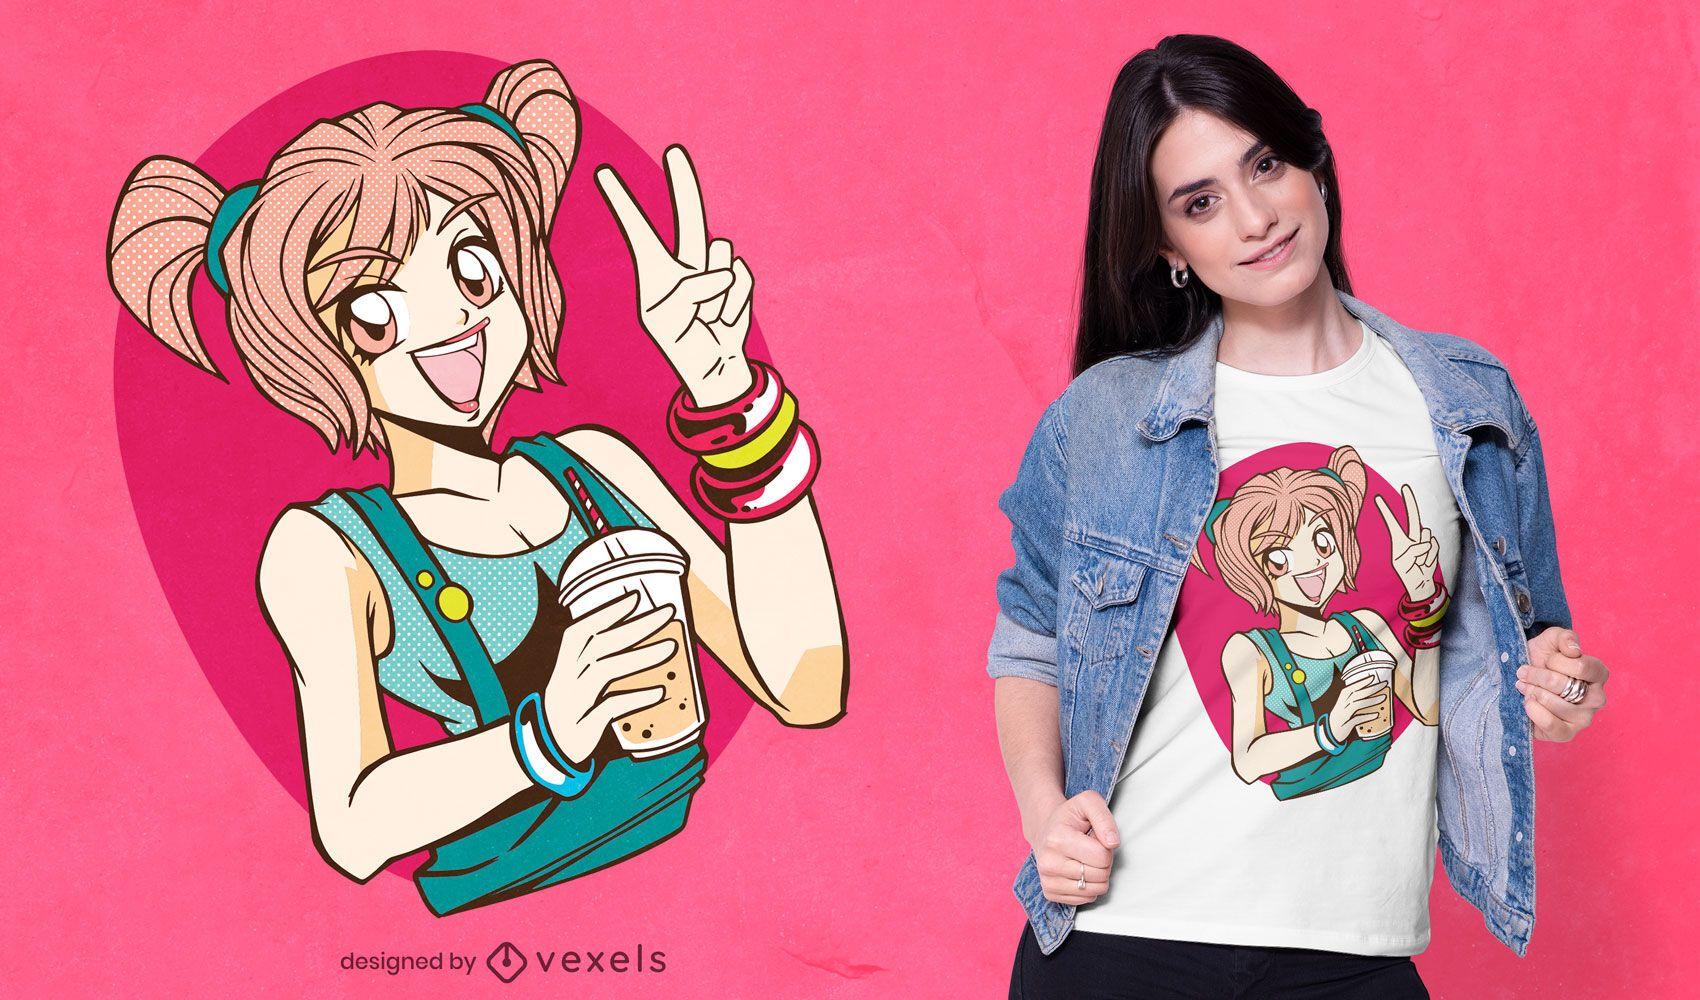 Anime bubble tea girl t-shirt design